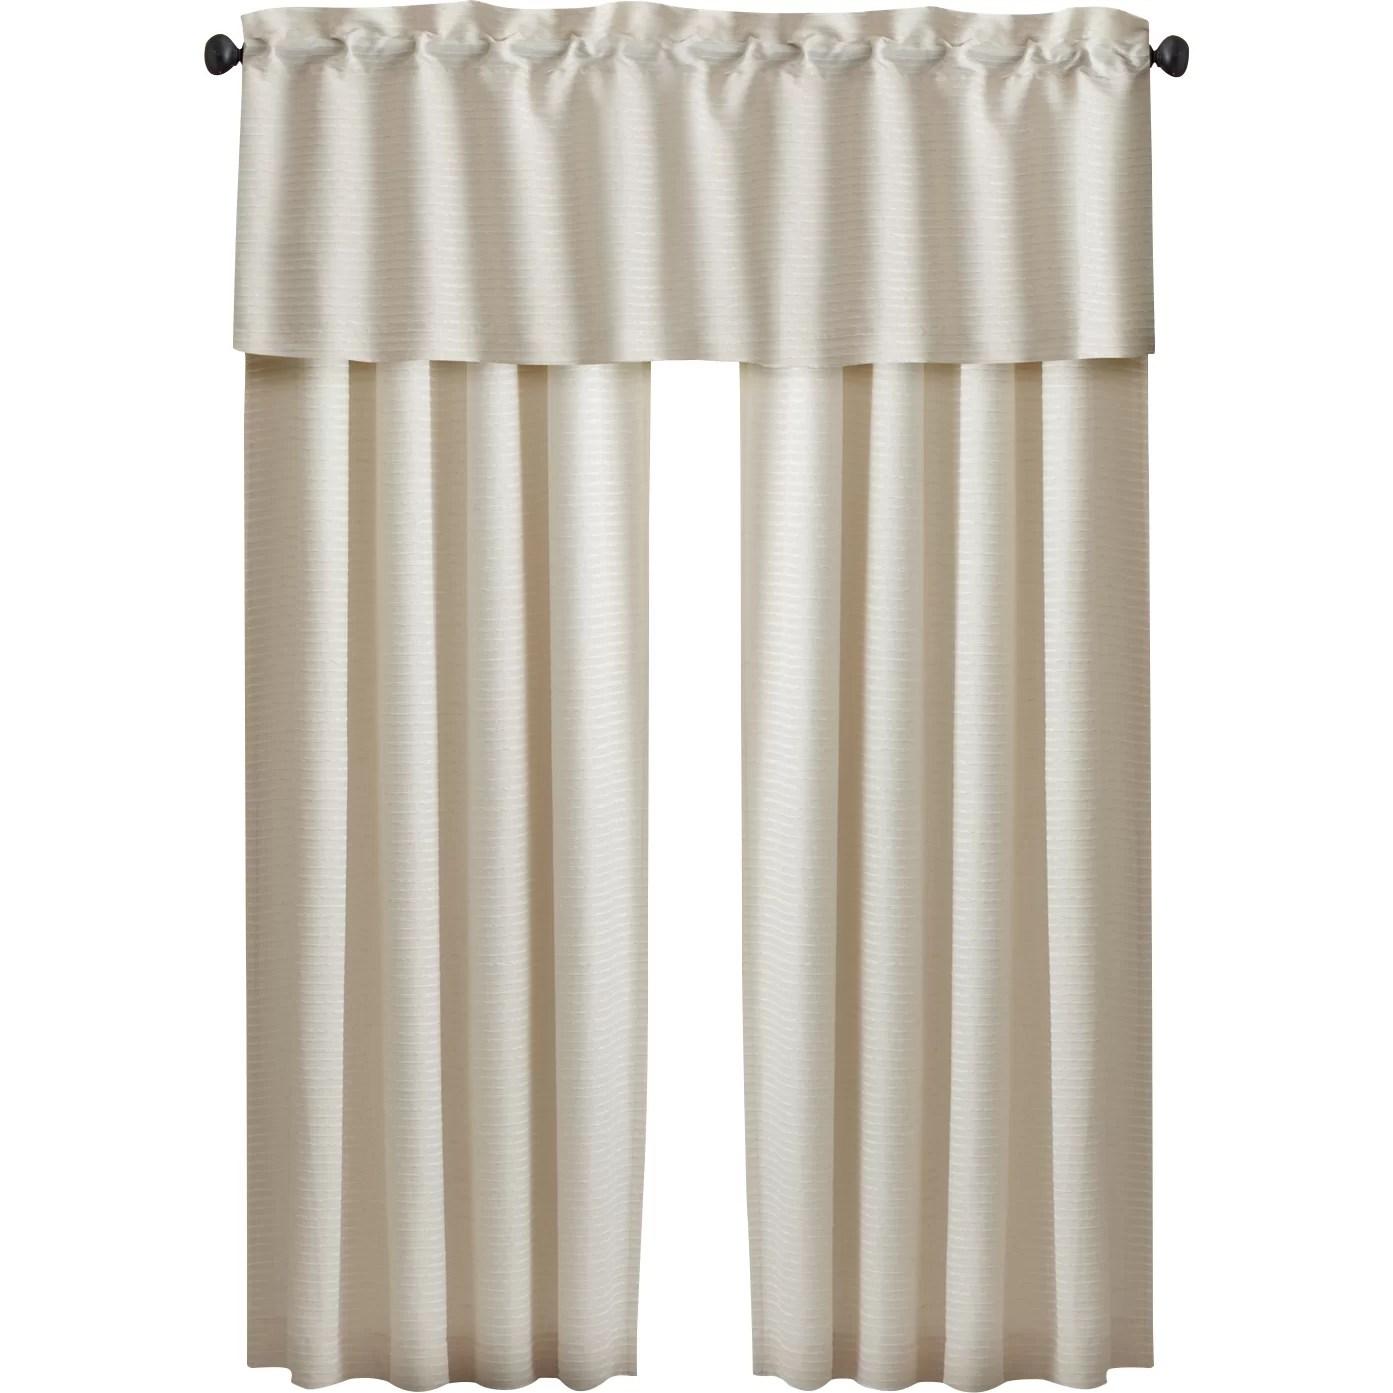 Croscill Murray Hill Curtain Valance